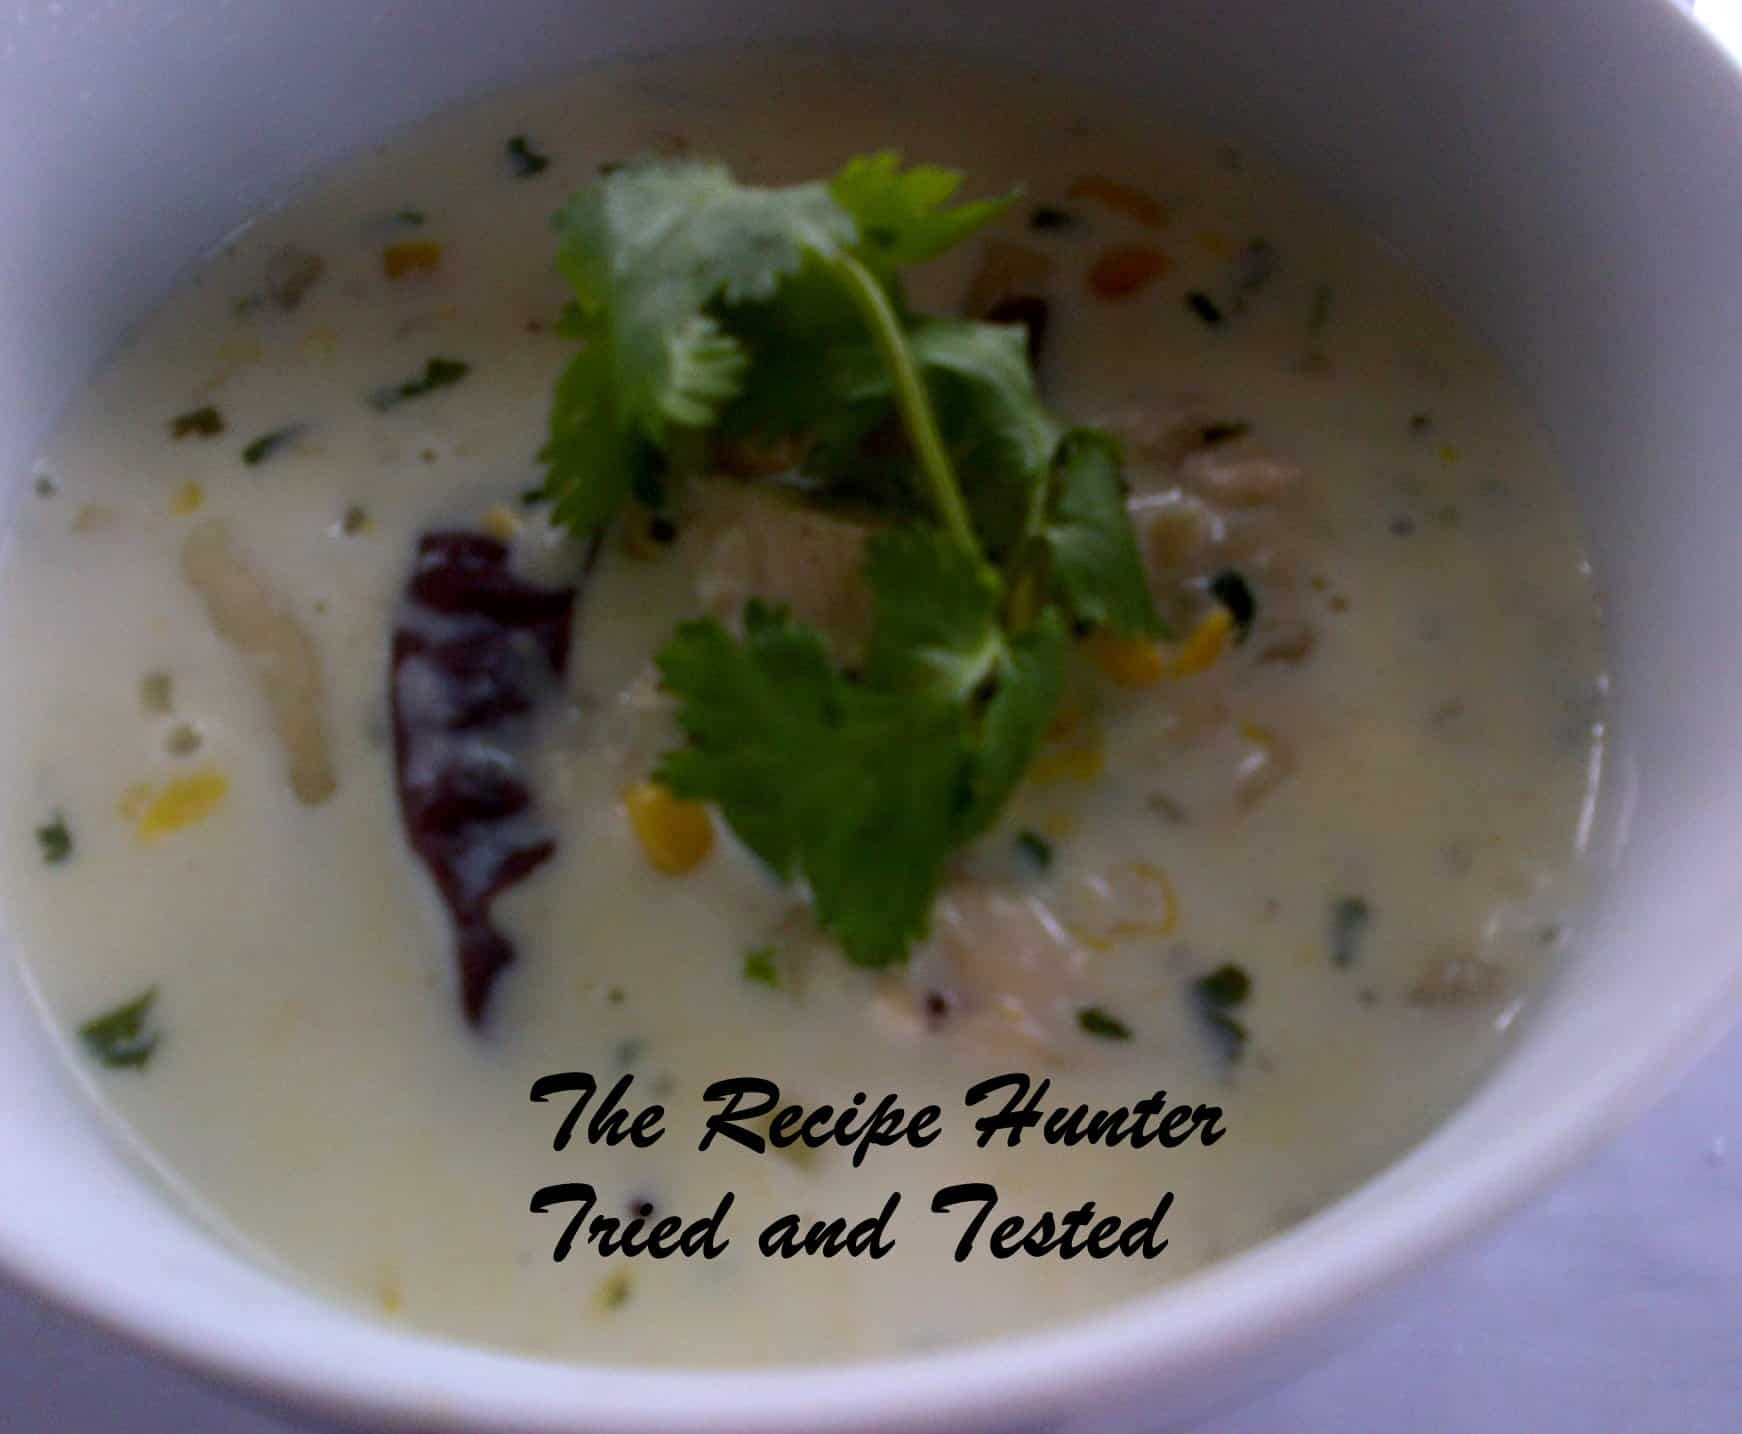 TRH Nazley's Spicy Creamy Chicken & Sweet Corn soup